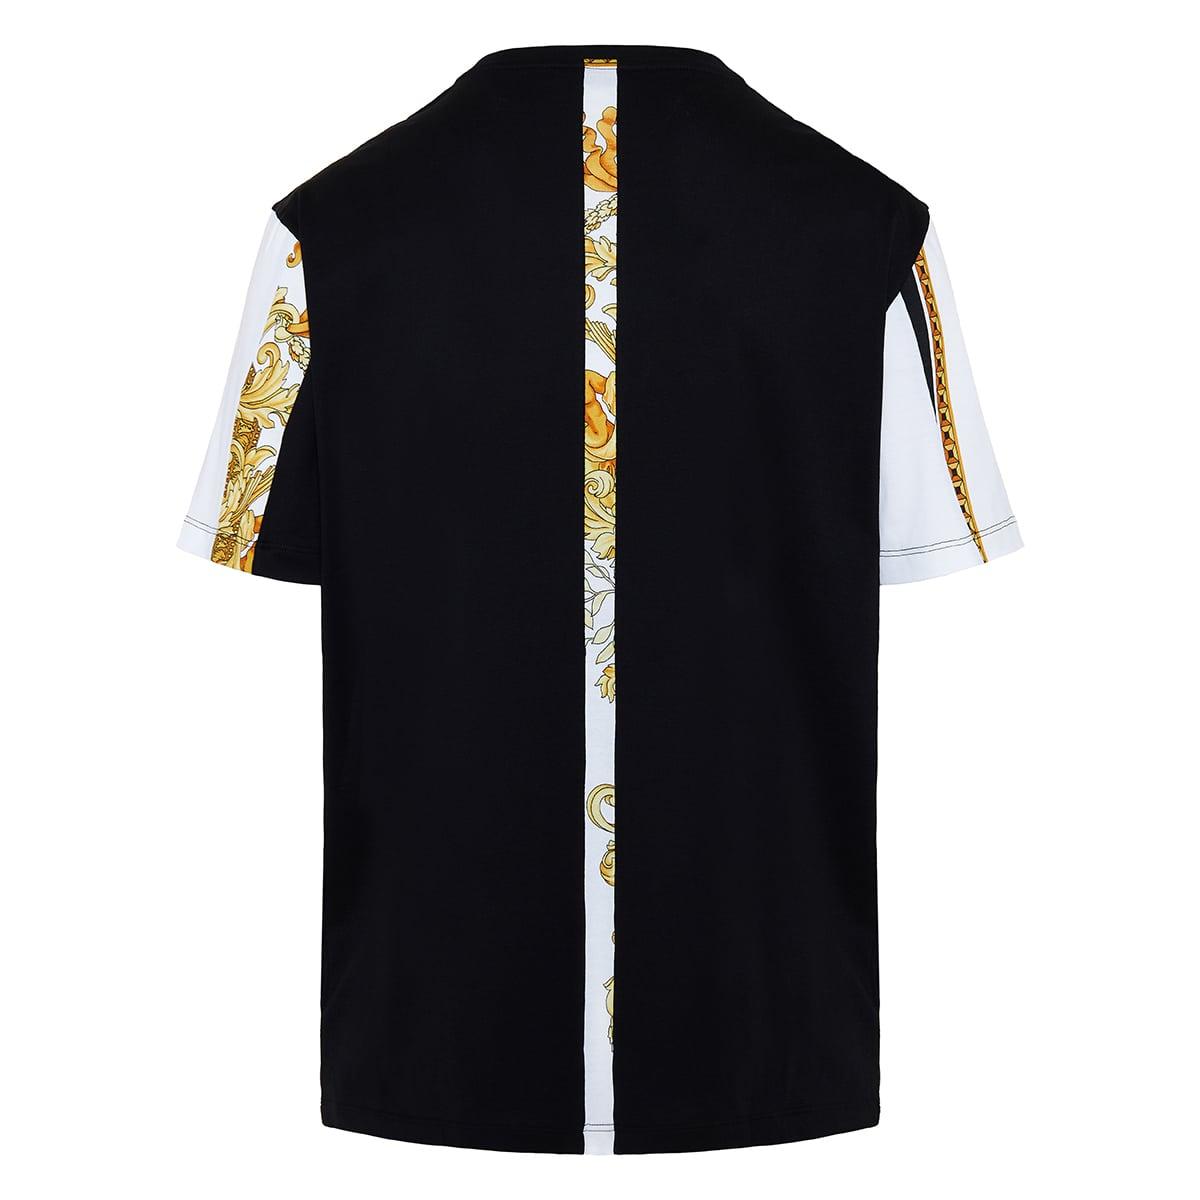 Baroque print striped t-shirt